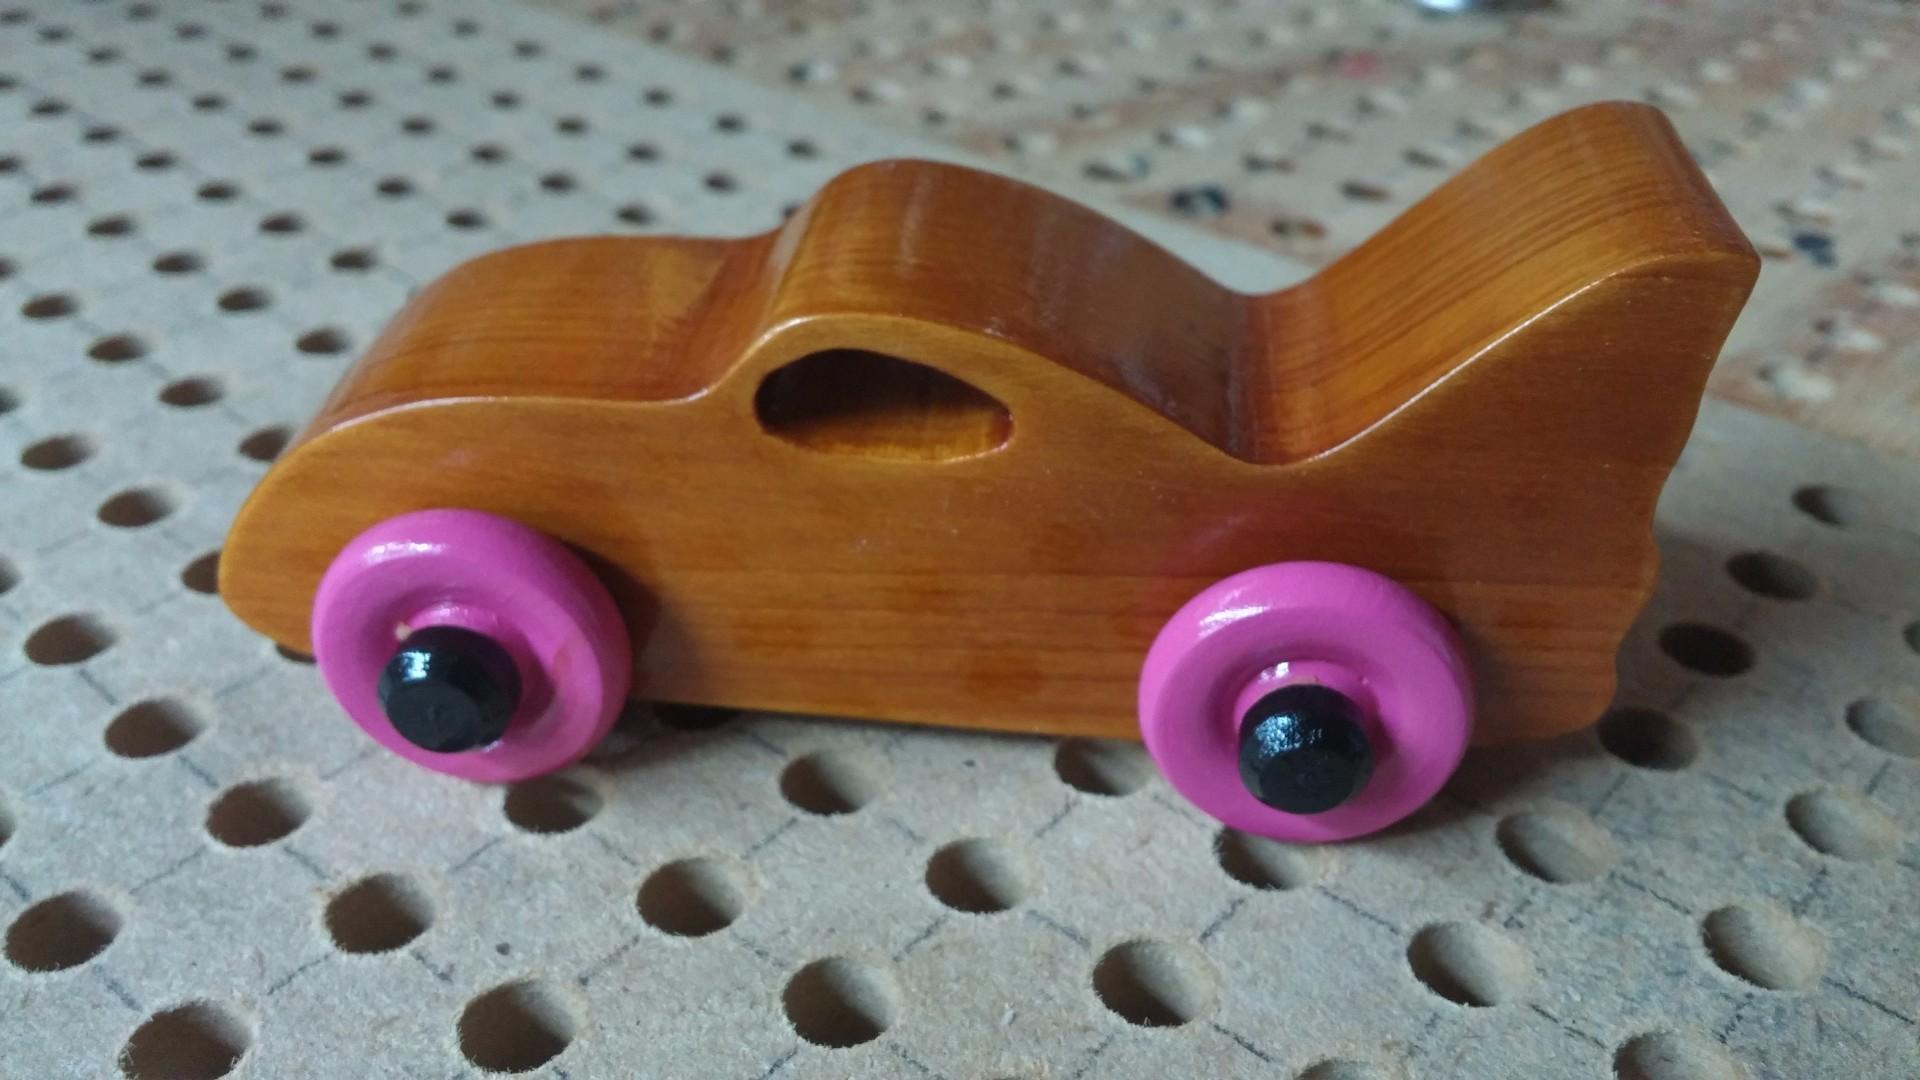 2017-08-05 14.13.07 2017-08-05 14.12.20 Wooden Toy Car - Bat Car - Pink Wheels - Odins Toy Factory.jpg